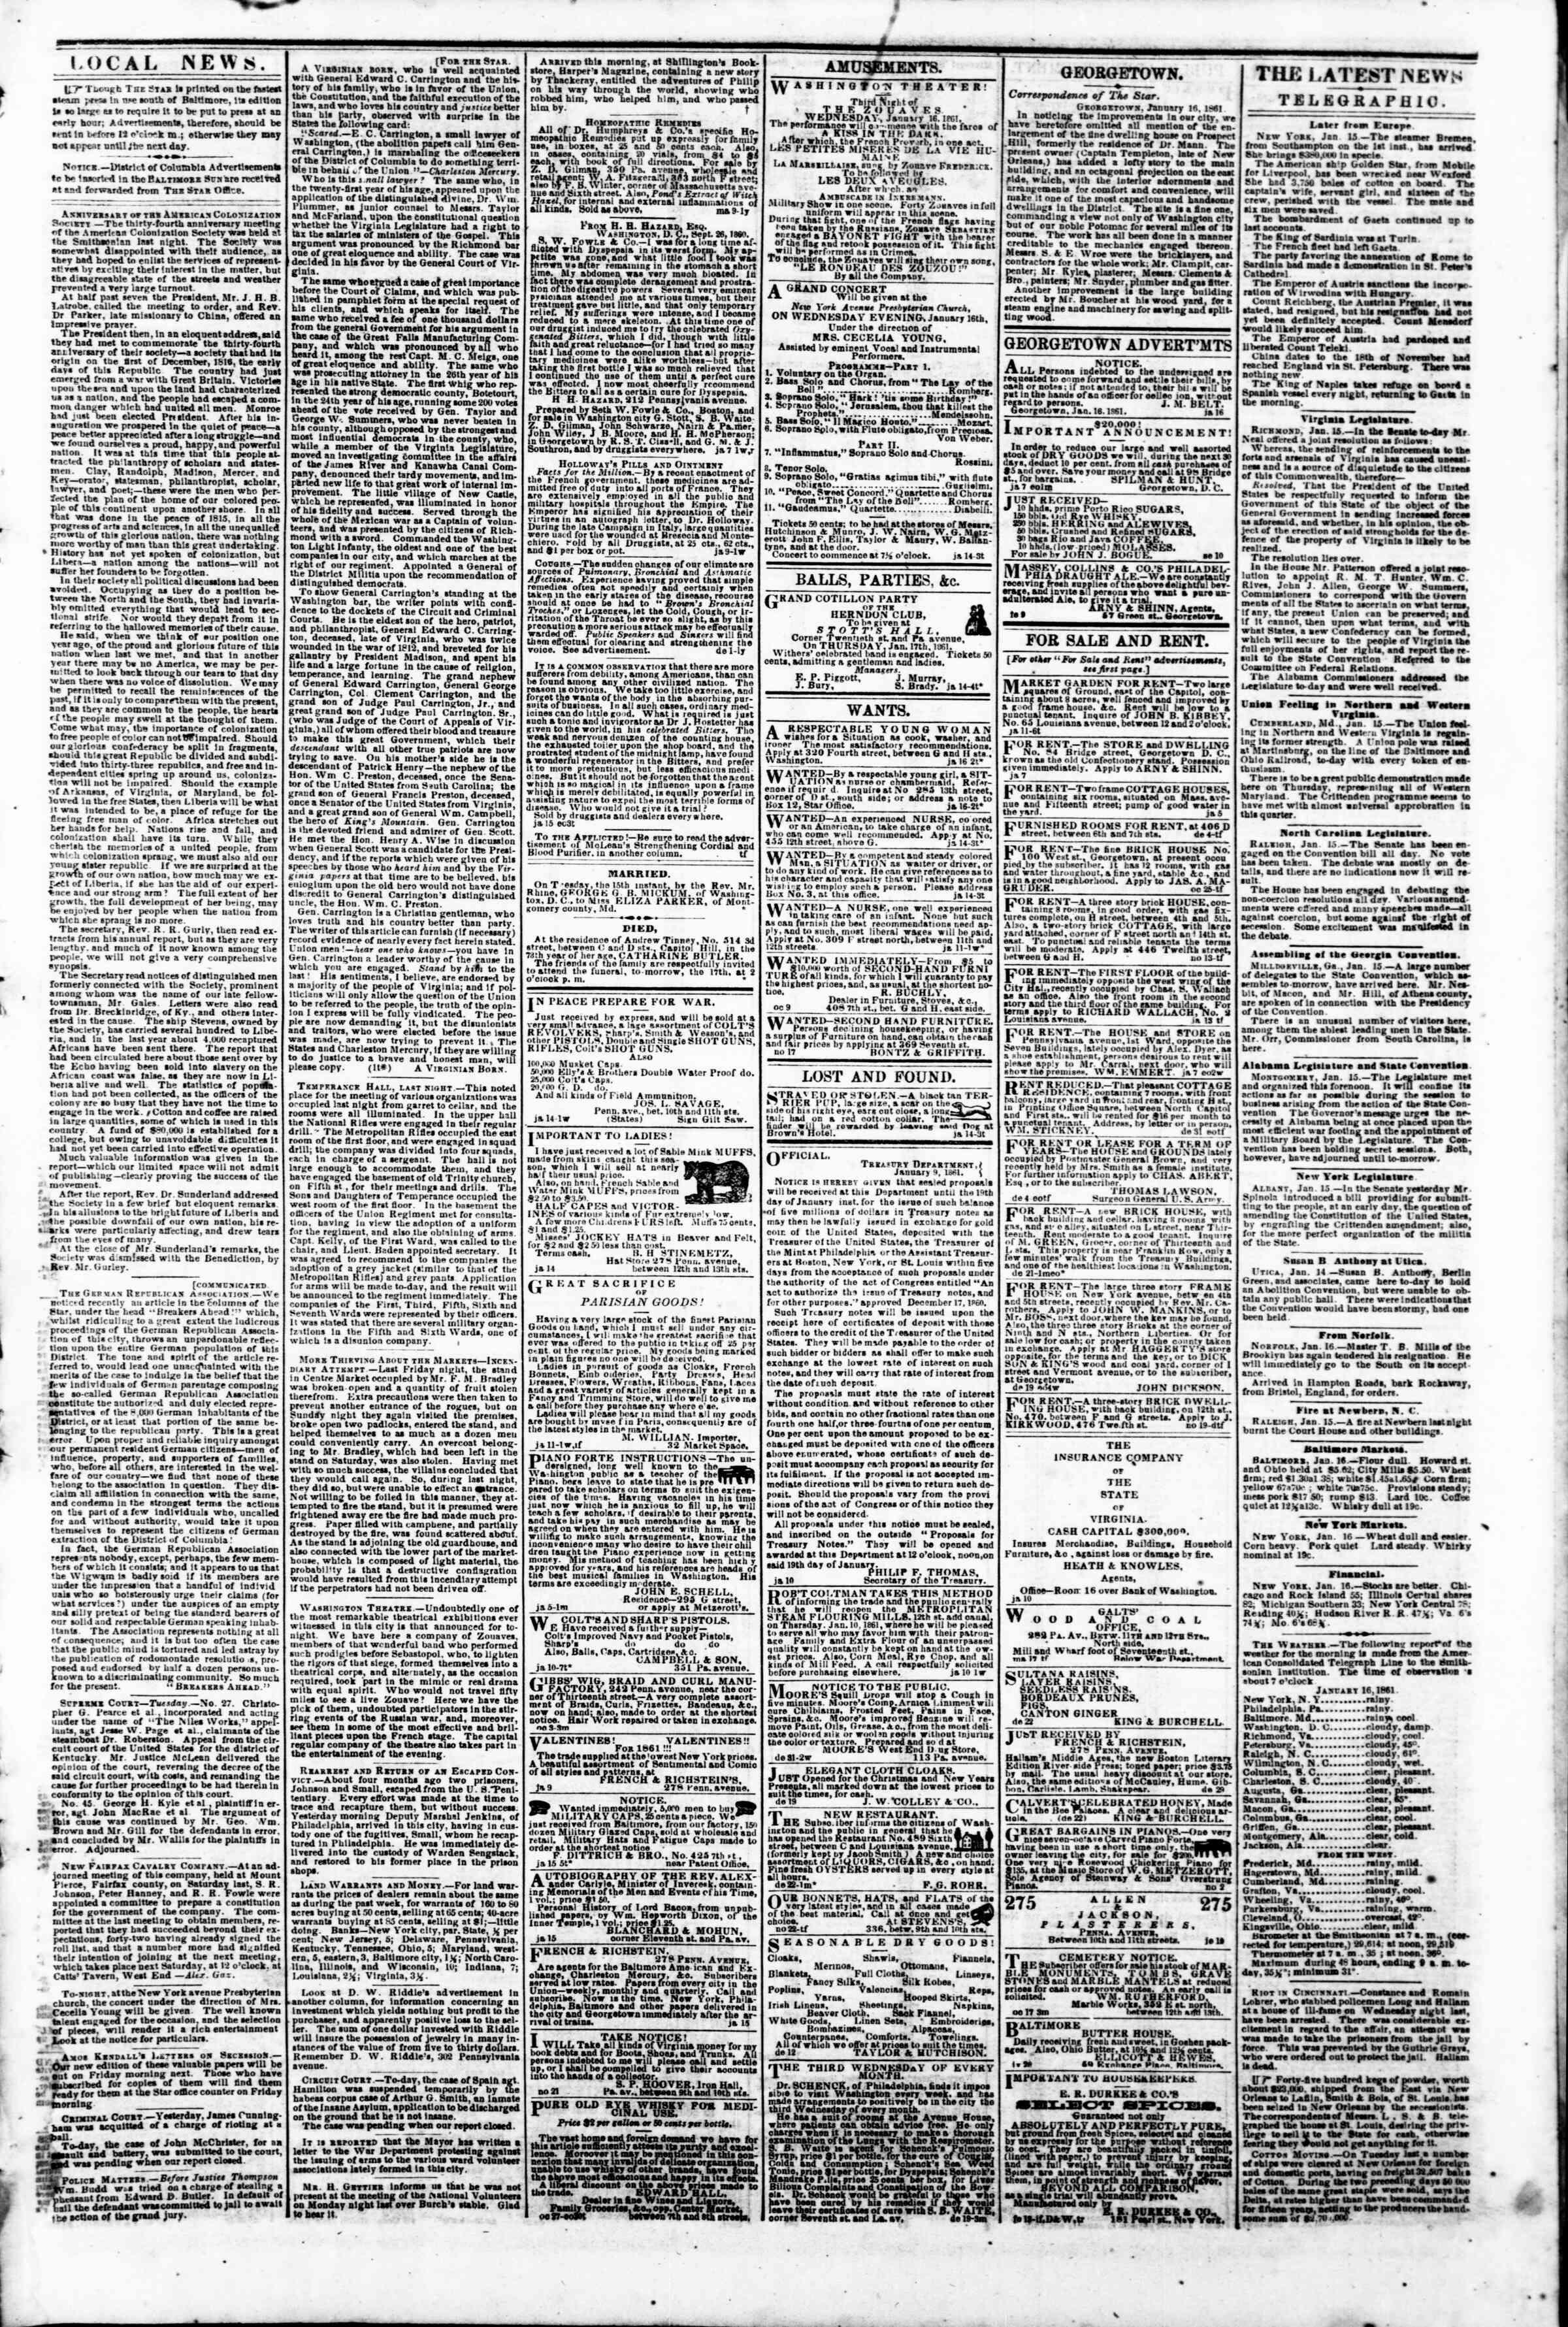 16 Ocak 1861 tarihli Evening Star Gazetesi Sayfa 3